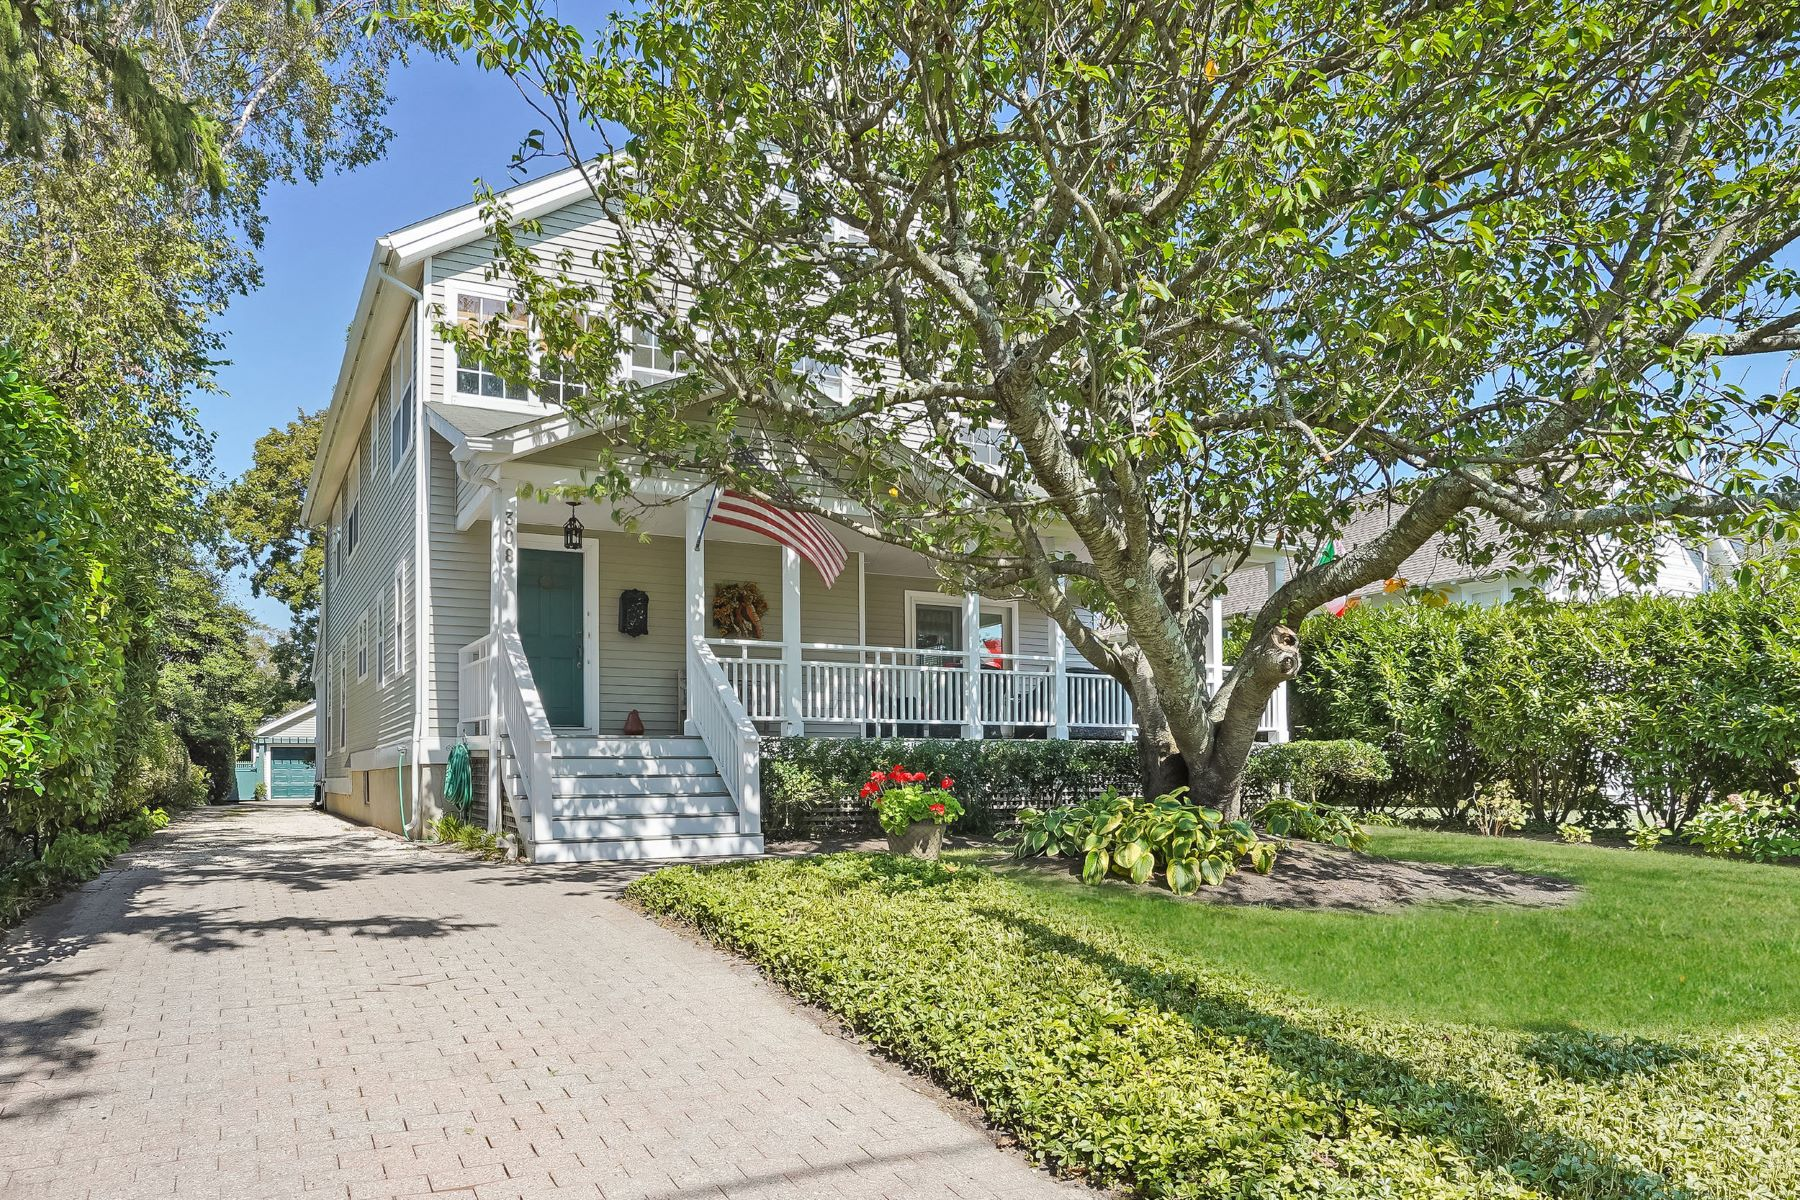 Single Family Homes για την Πώληση στο A Special Place to Make Memories 308 Pitney Avenue, Spring Lake, Νιου Τζερσεϋ 07762 Ηνωμένες Πολιτείες